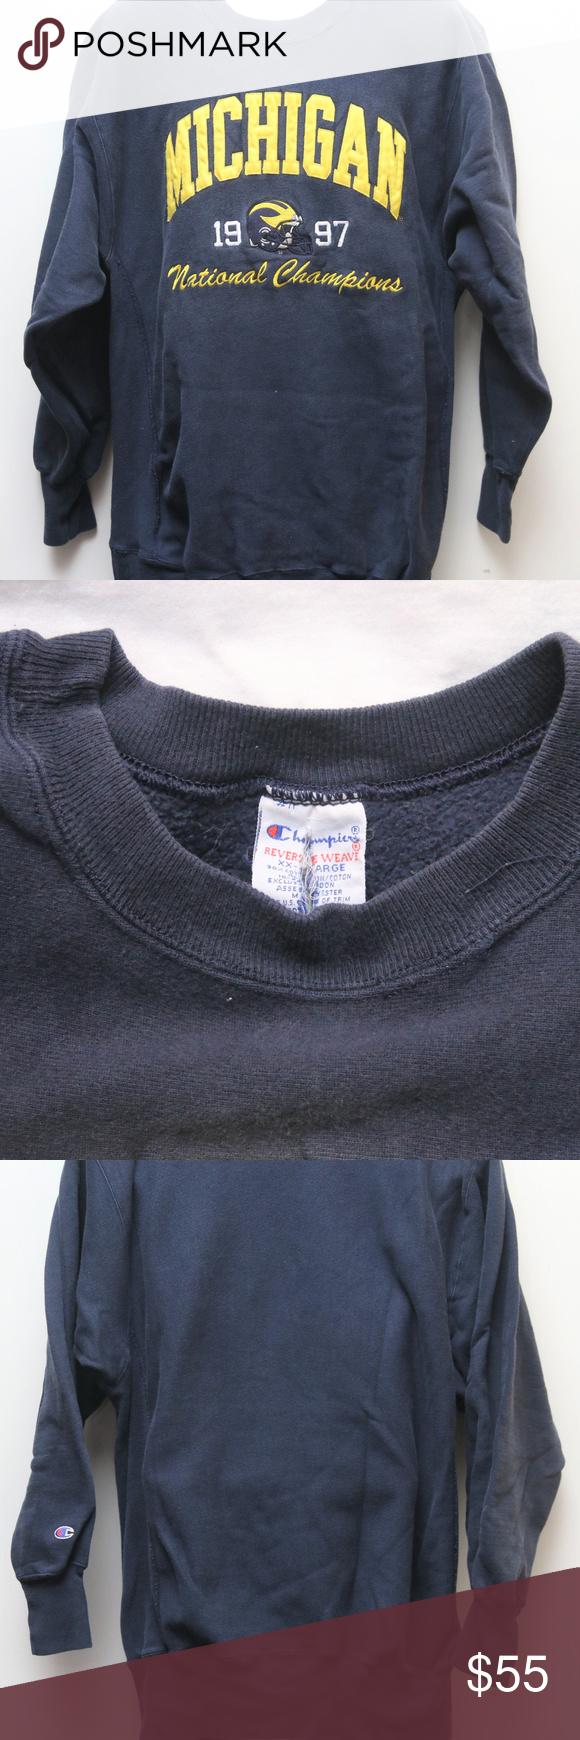 Vtg Champion Michigan 97 Nat L Champs Sweatshirt 1997 Vintage Champion Reverse Weave Michigan Wolverines 1997 Sweatshirts Champion Shirts Sweatshirt Shirt [ 1740 x 580 Pixel ]